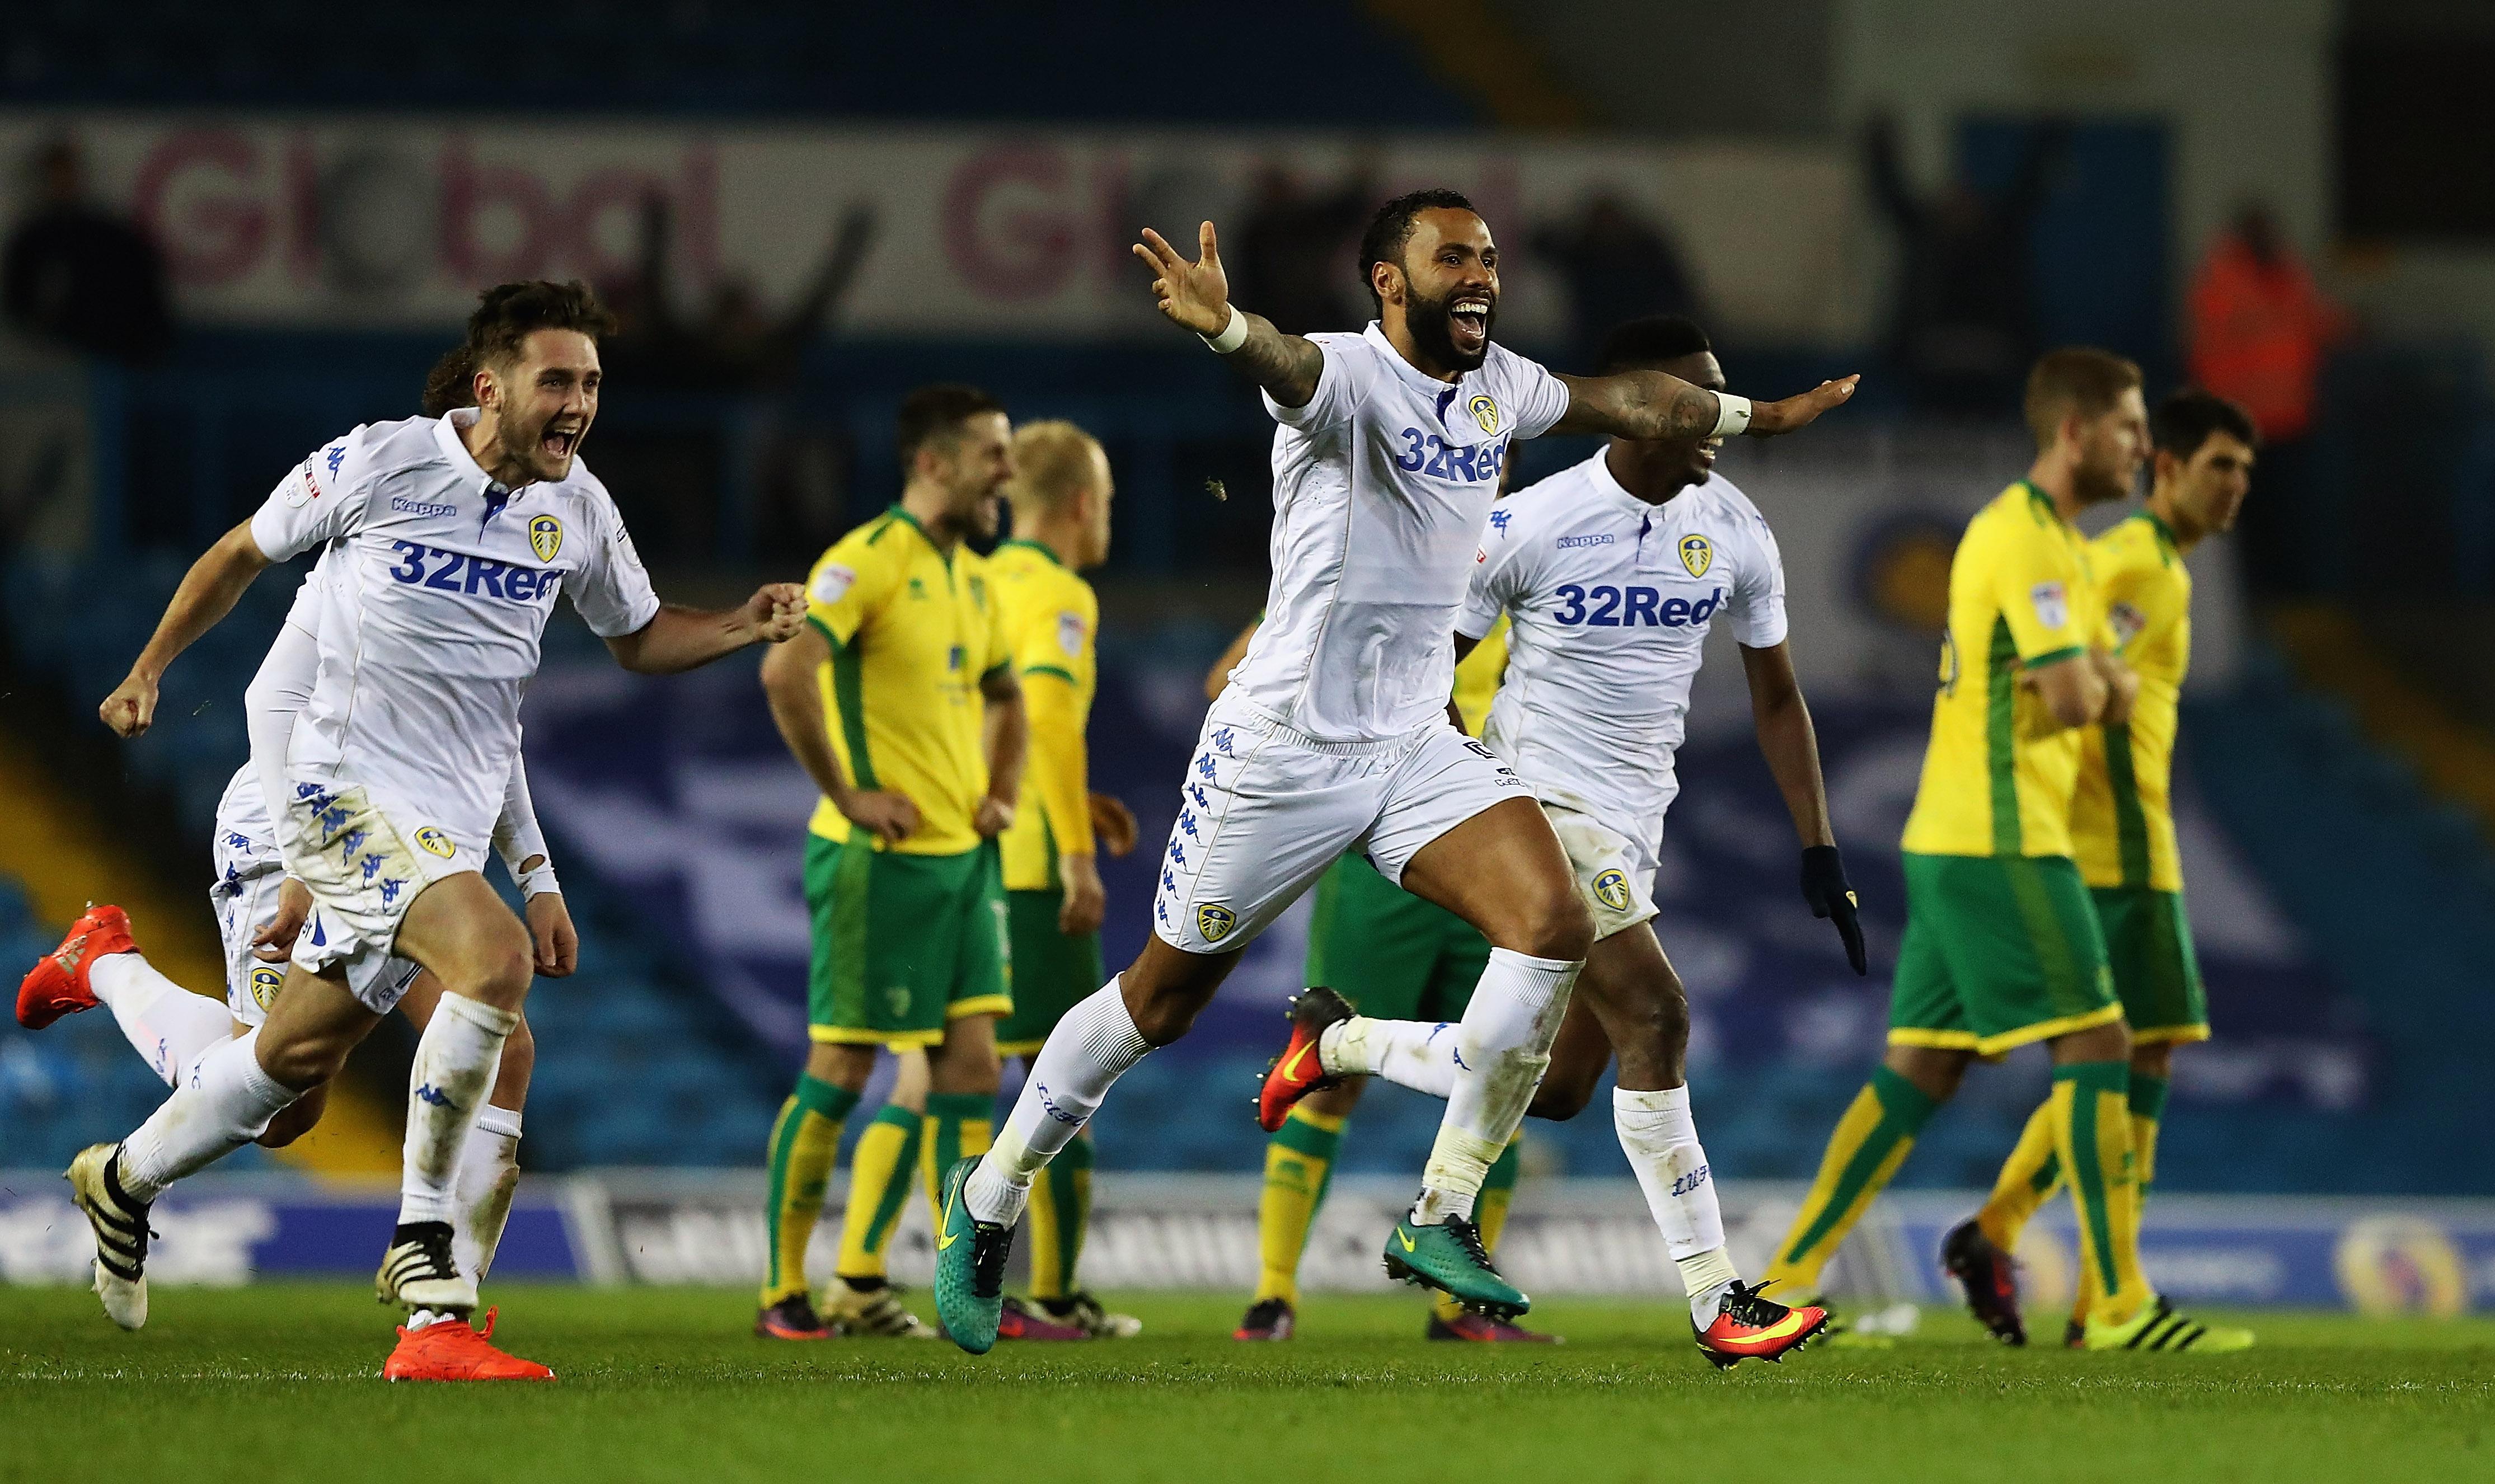 How sweet that was. All Leeds aren't we?